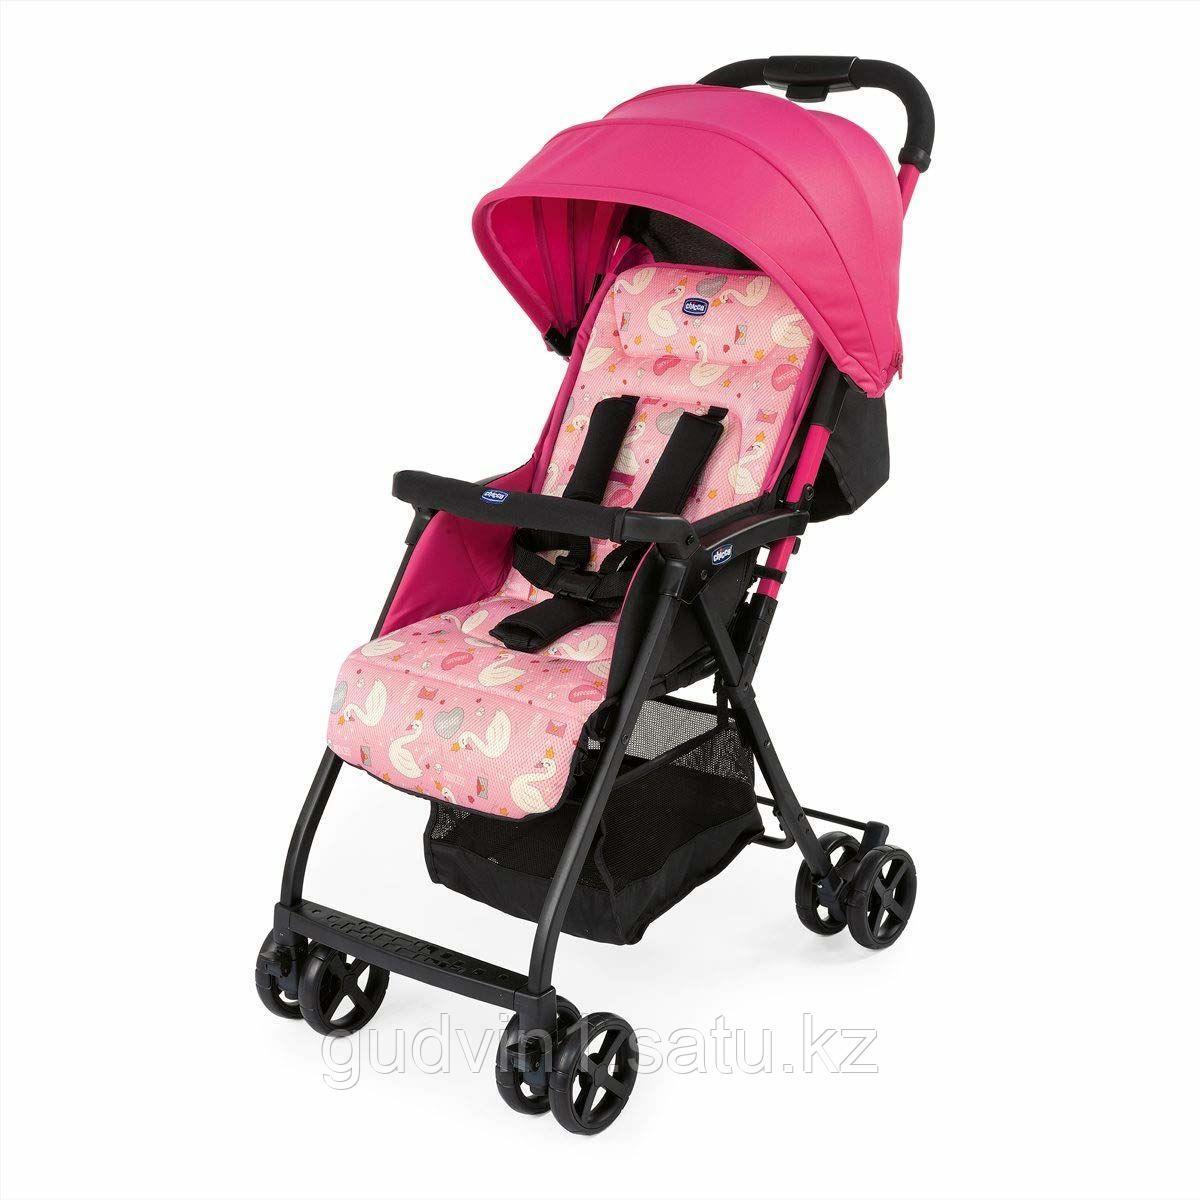 Chicco: Прогулочная коляска Ohlala 2 Pink Swan код: 1151663